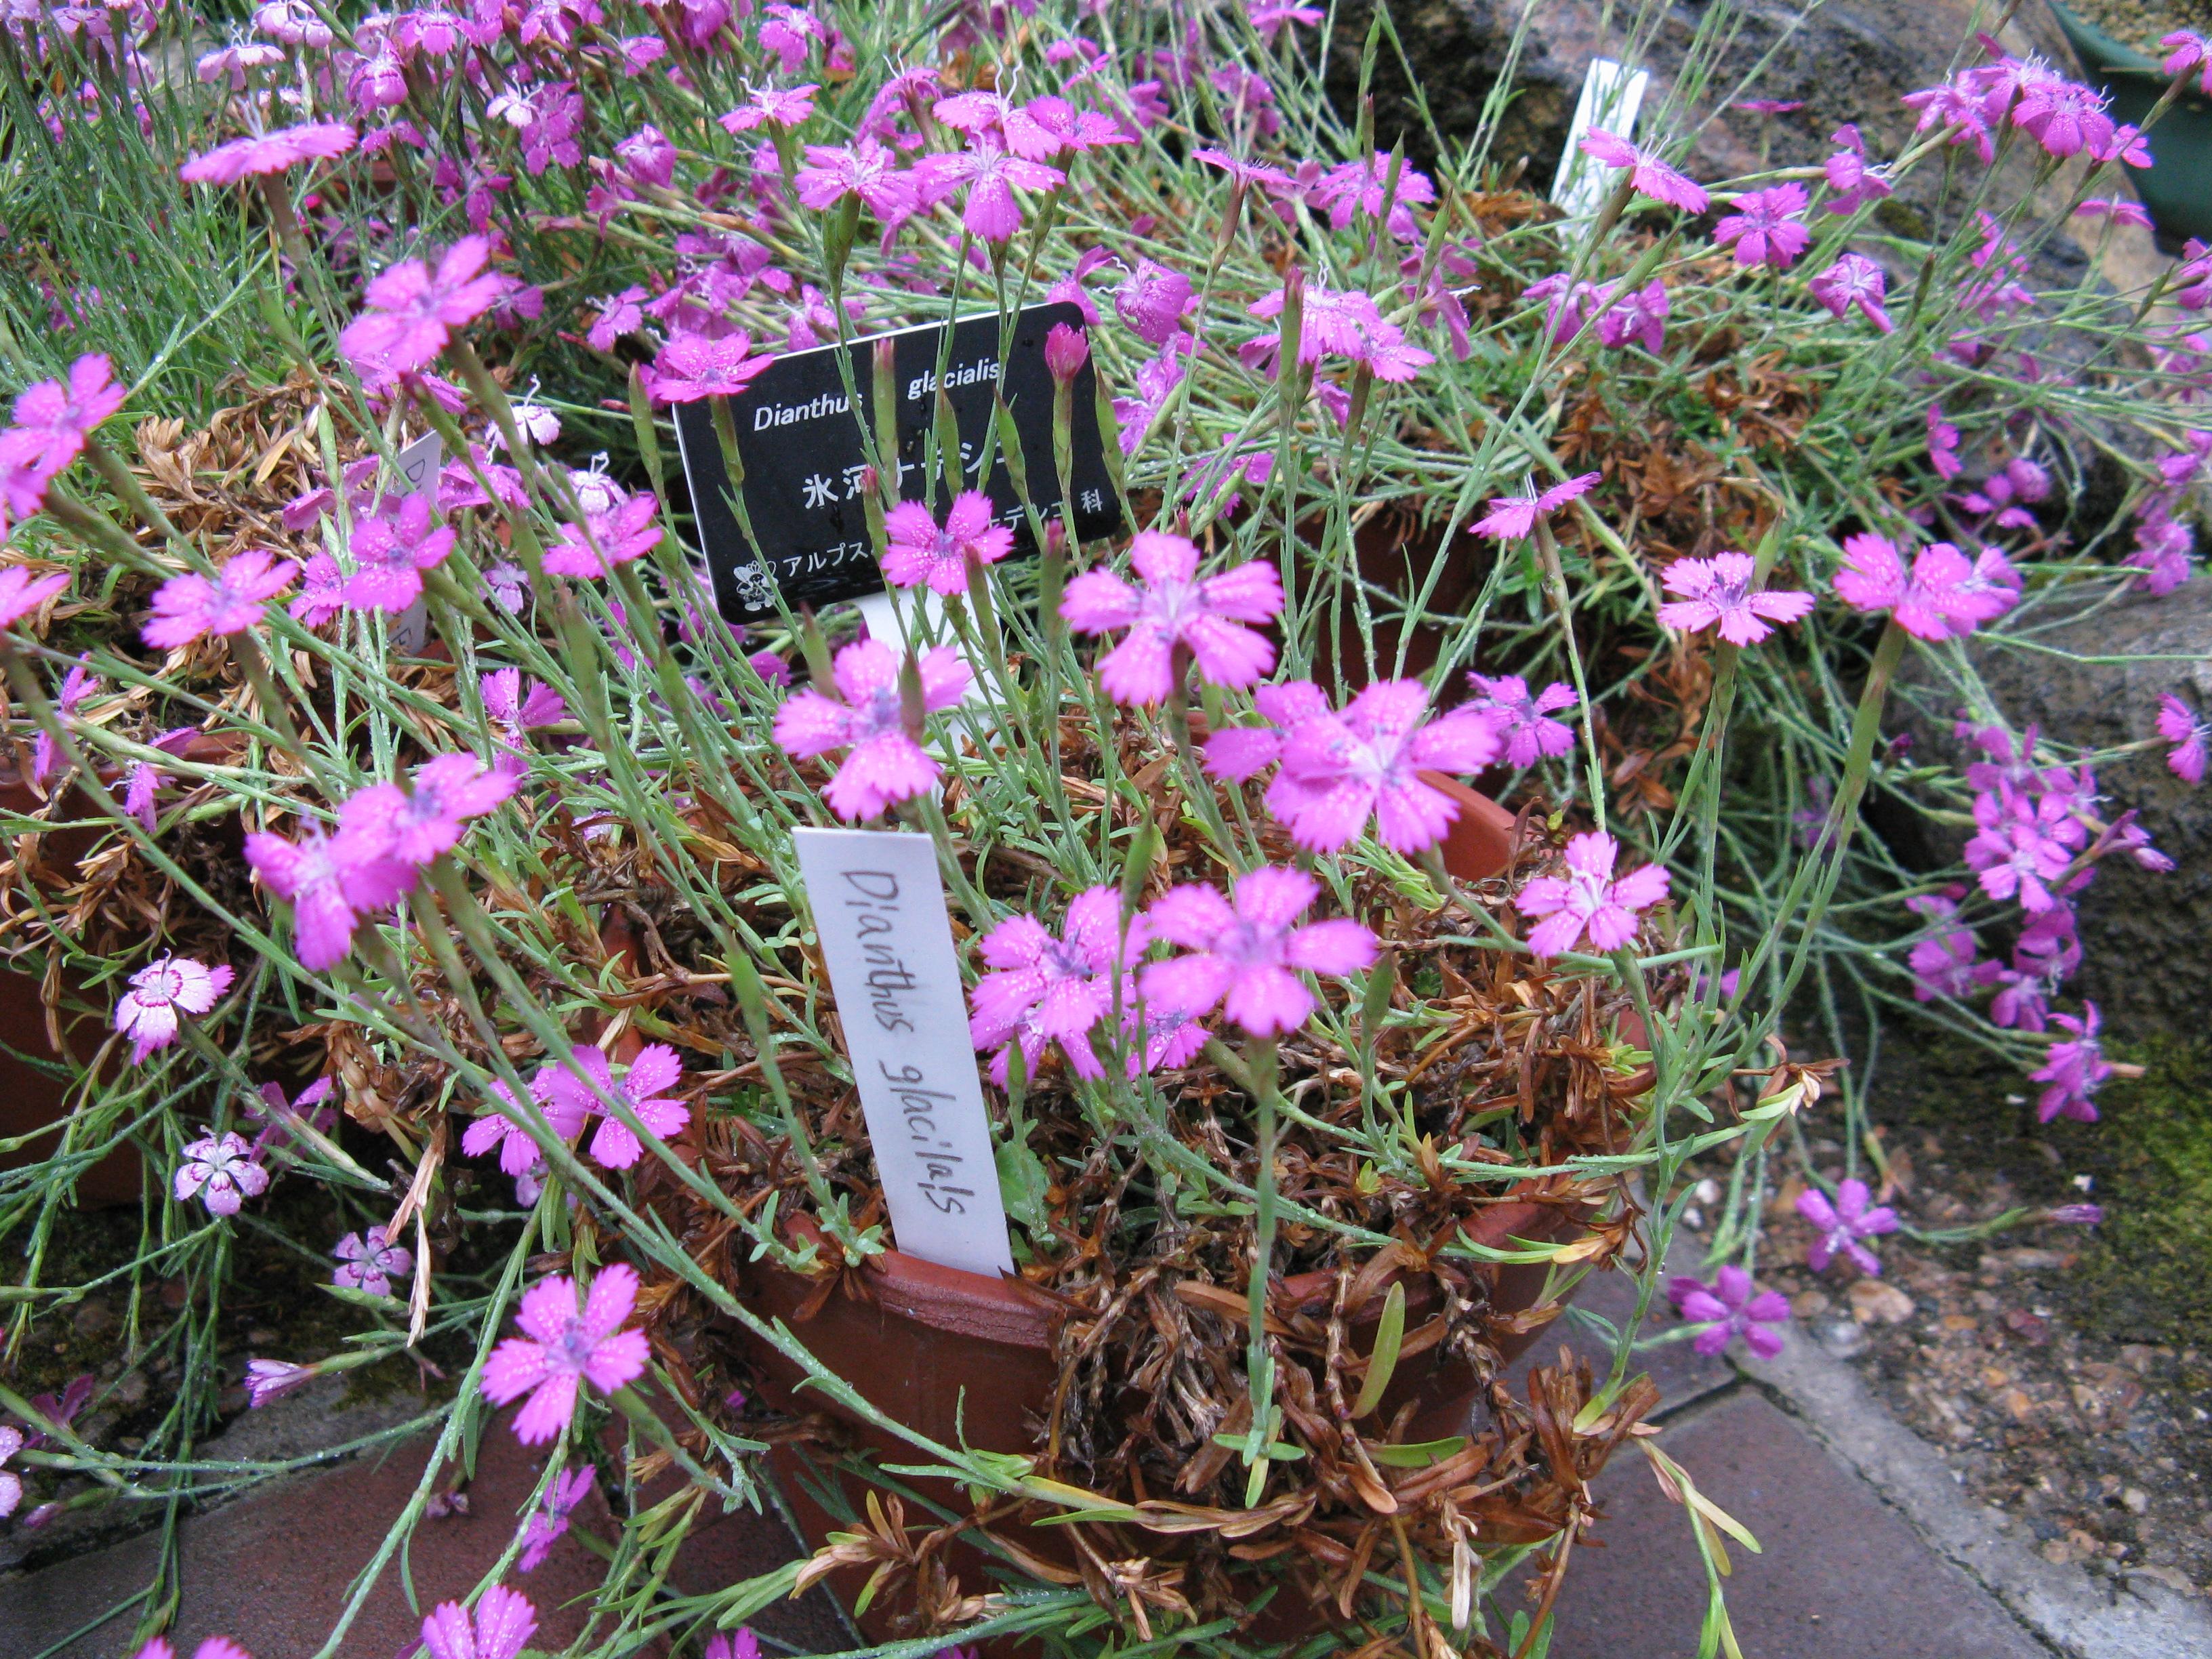 File:Dianthus glacialis1.jpg.